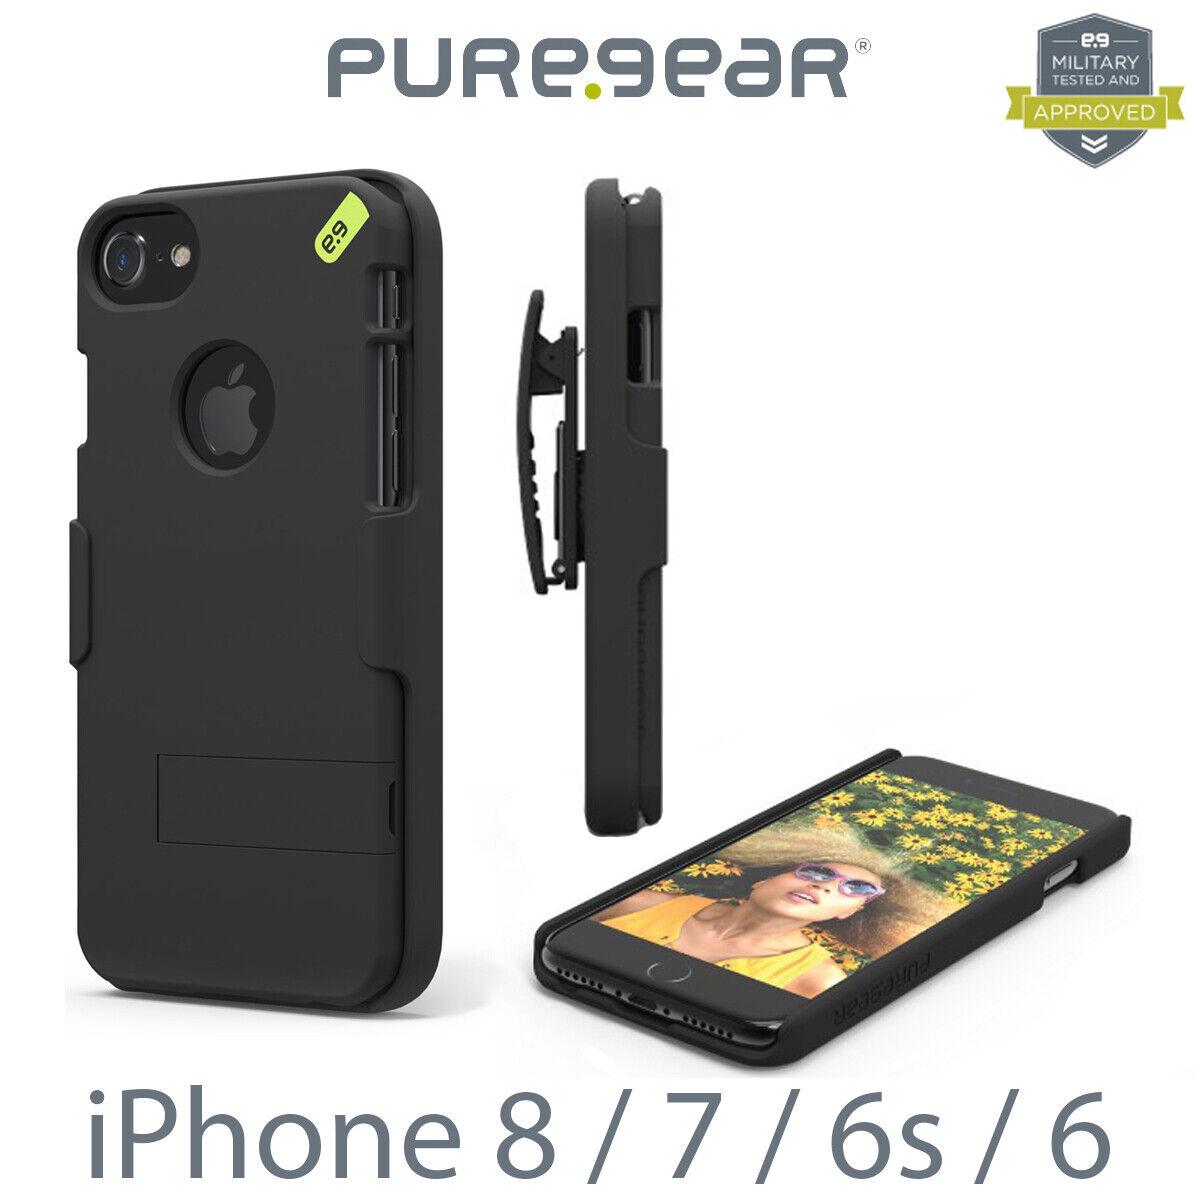 PureGear Hip Case Combo Holster Credit Card Slot iPhone 8 / 7